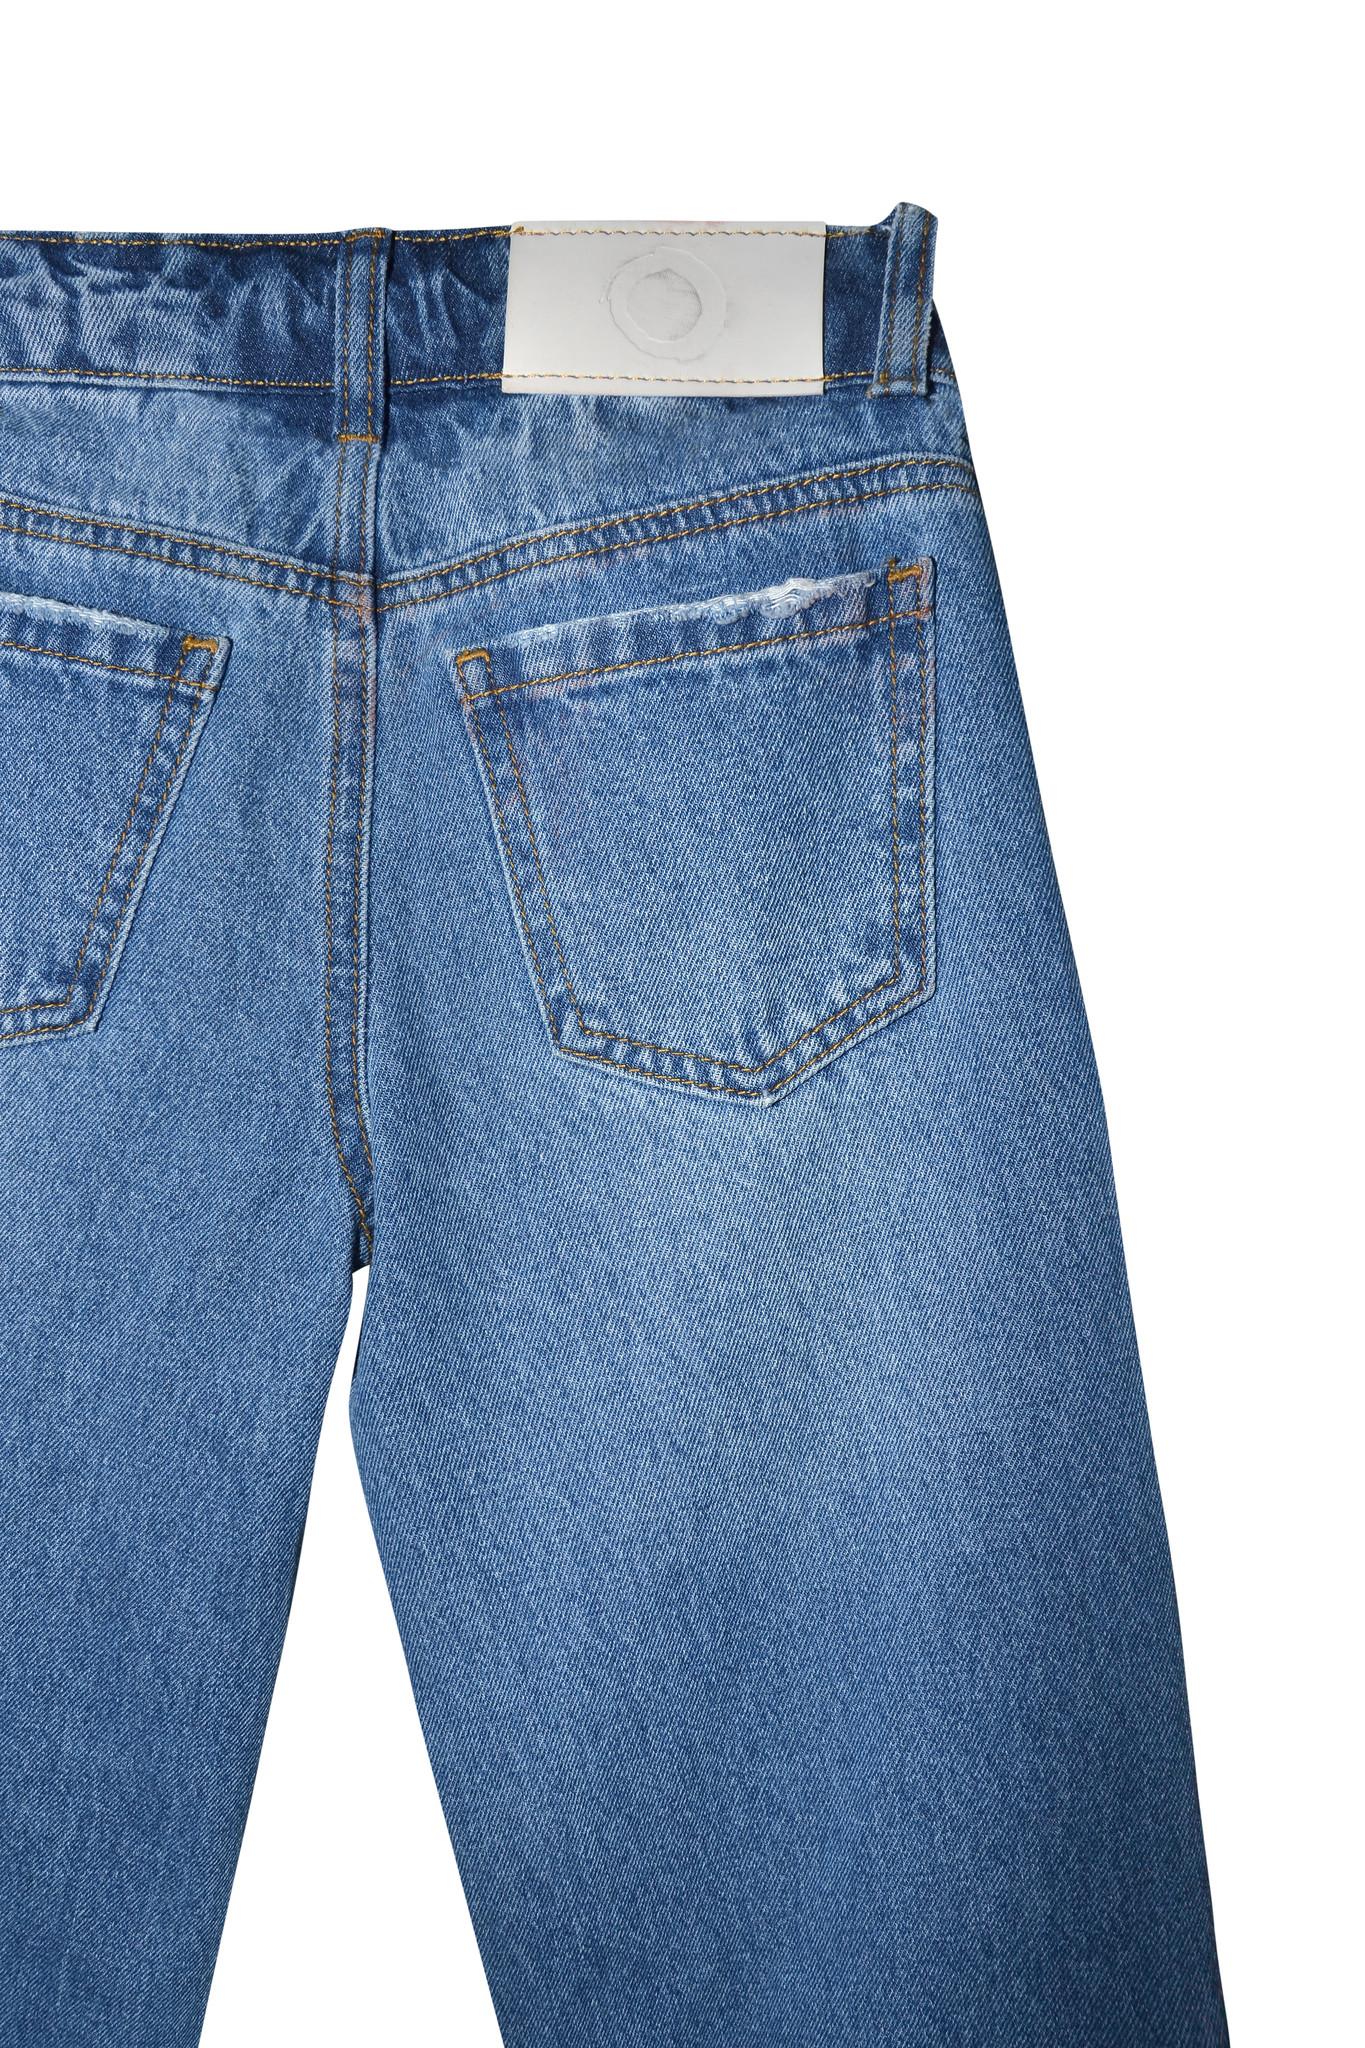 Stiles wide jeans-7